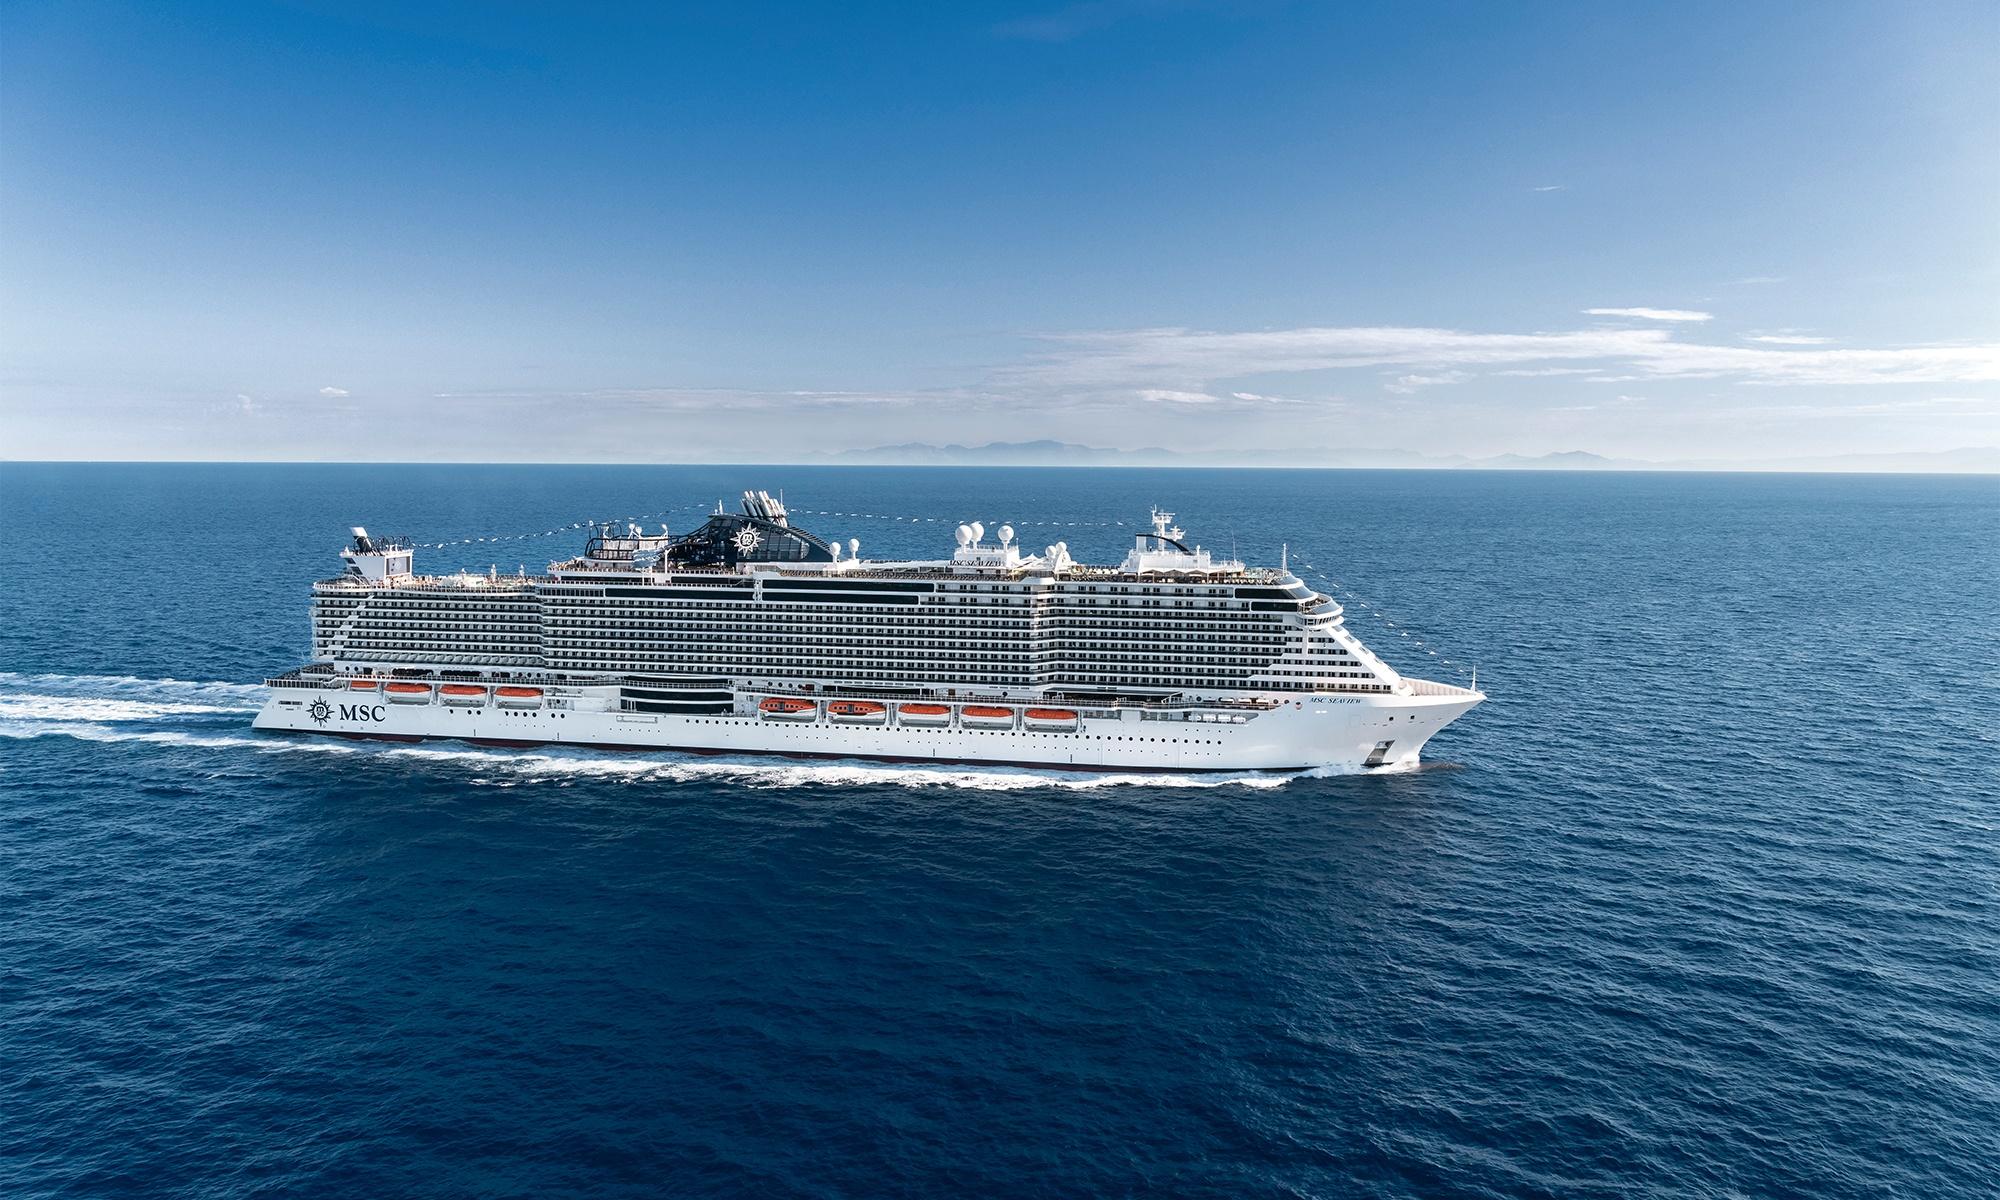 MSC Seaview Cruise Ship Reviews & Itineraries